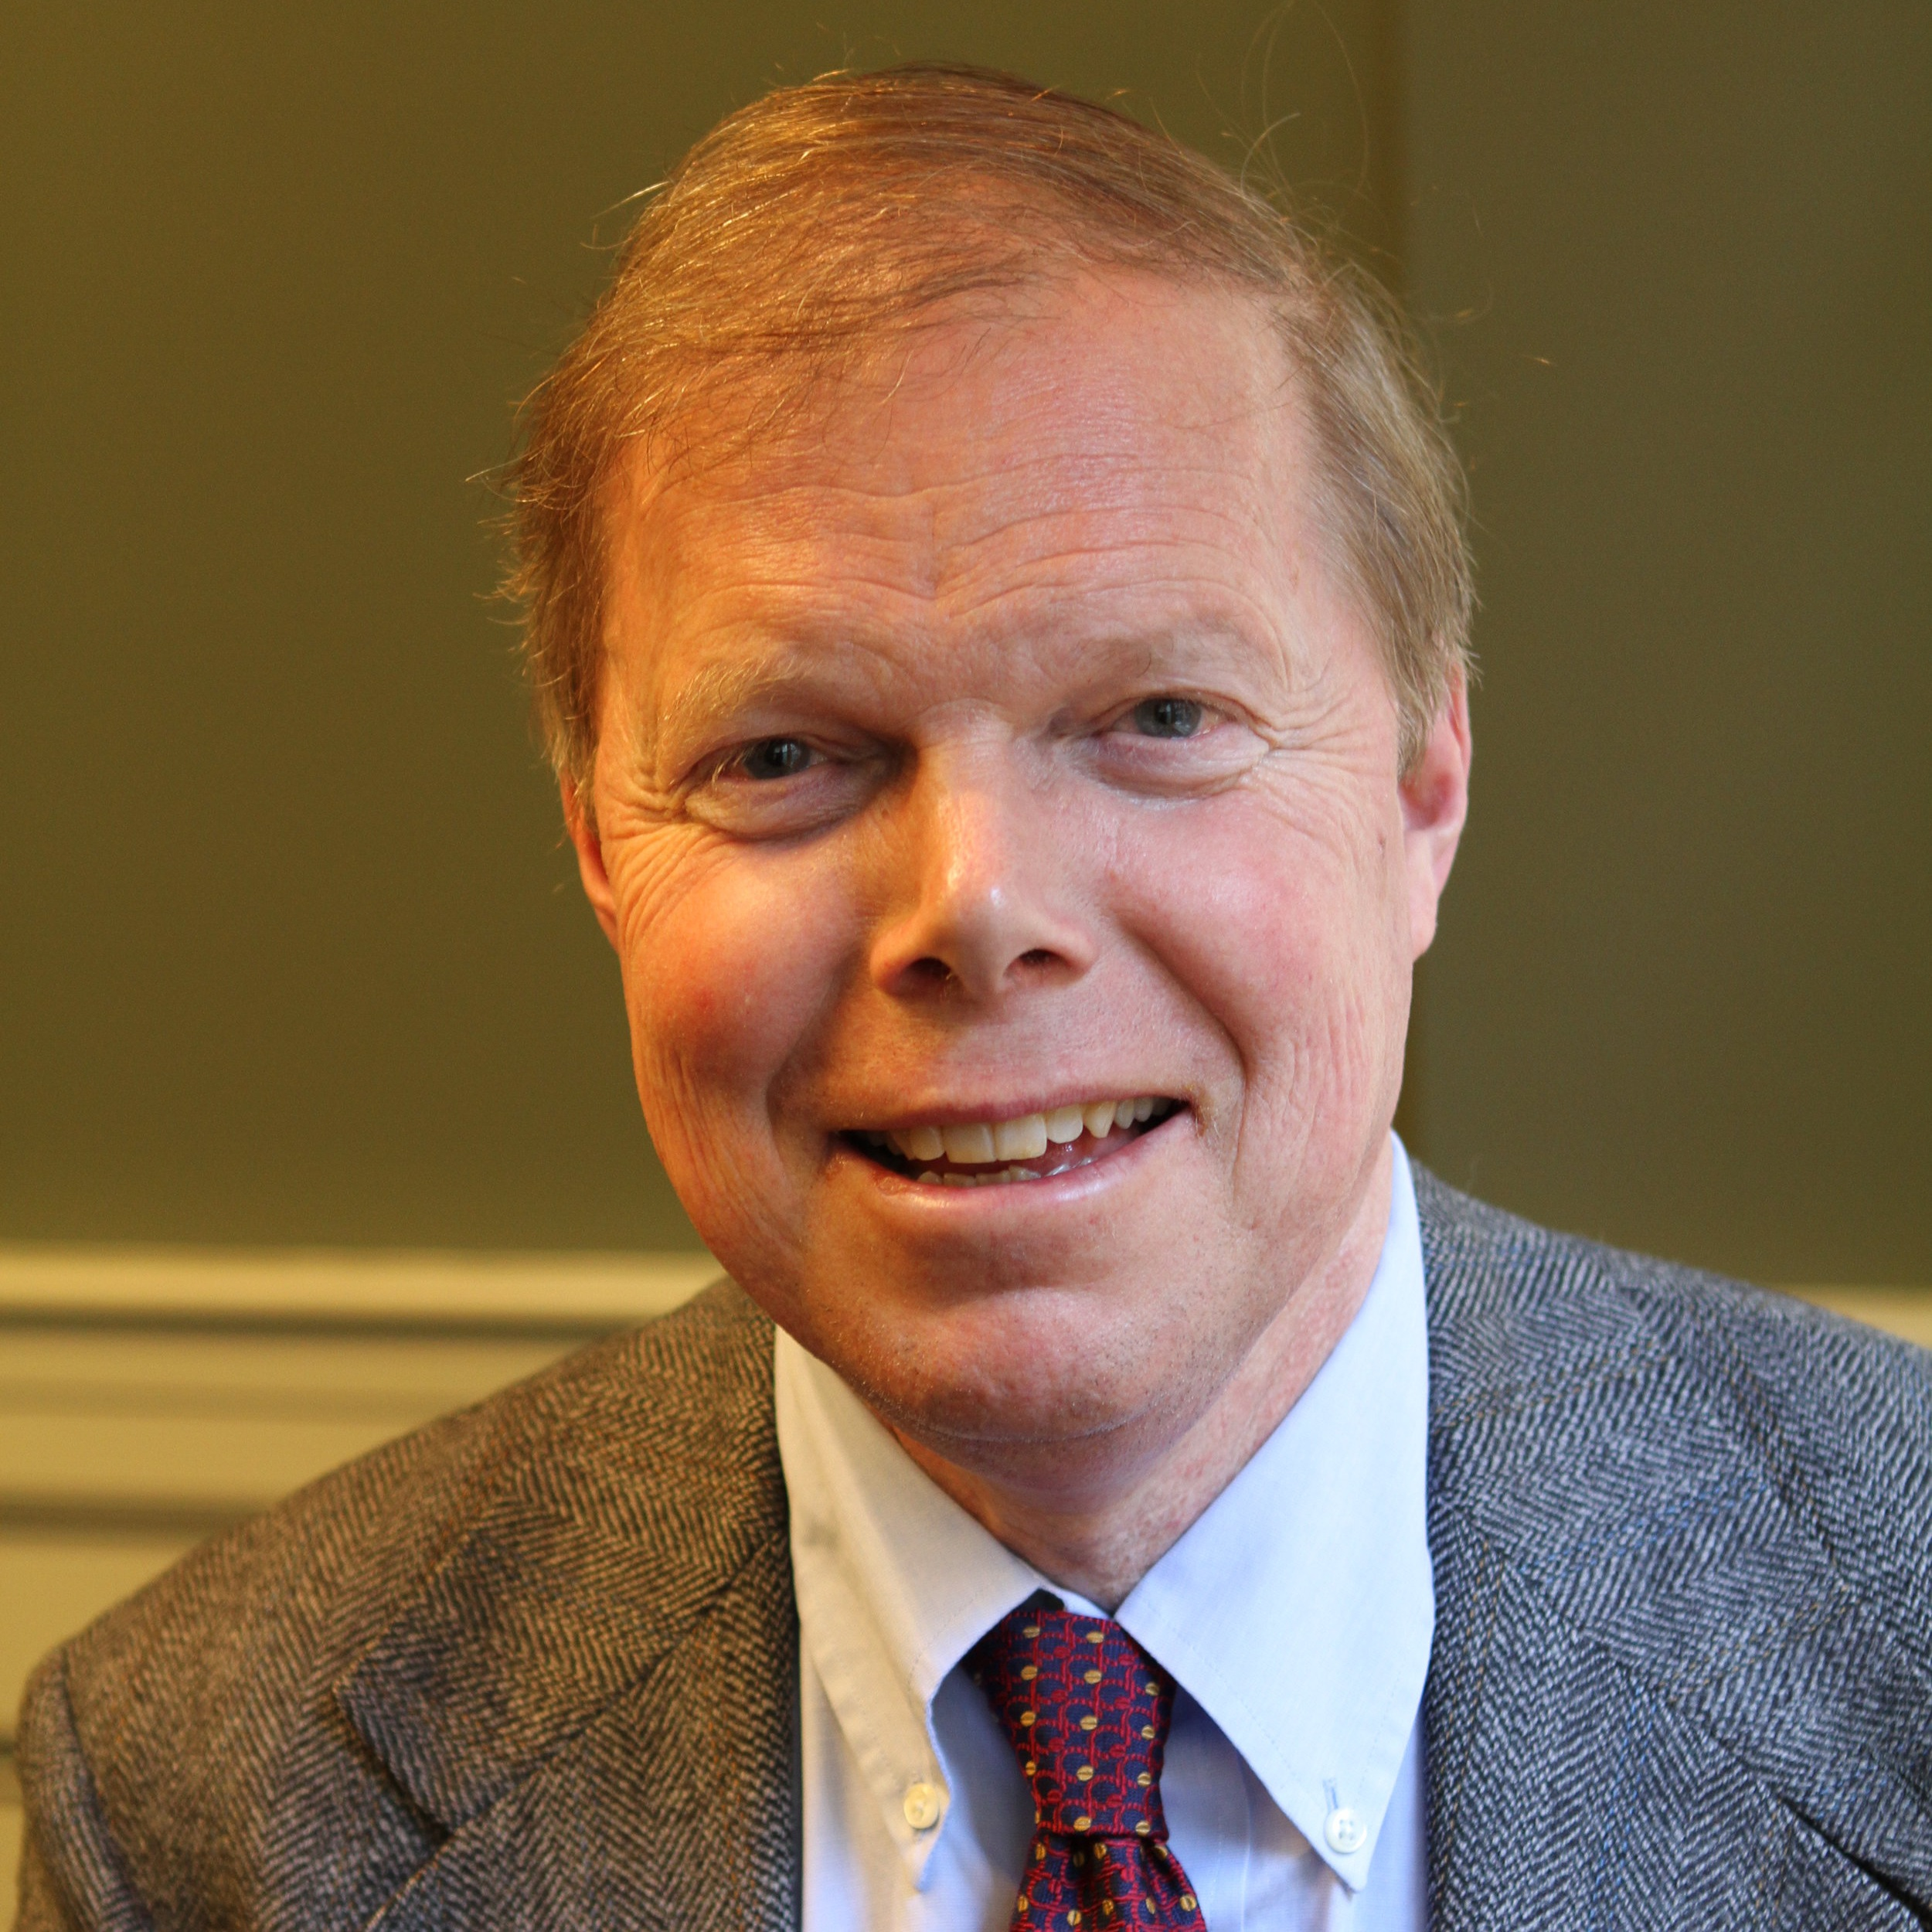 William C. Symonds - Director, Global Pathways Institute at Arizona State UniversityExecutive Secretary, Coalition for Career Development